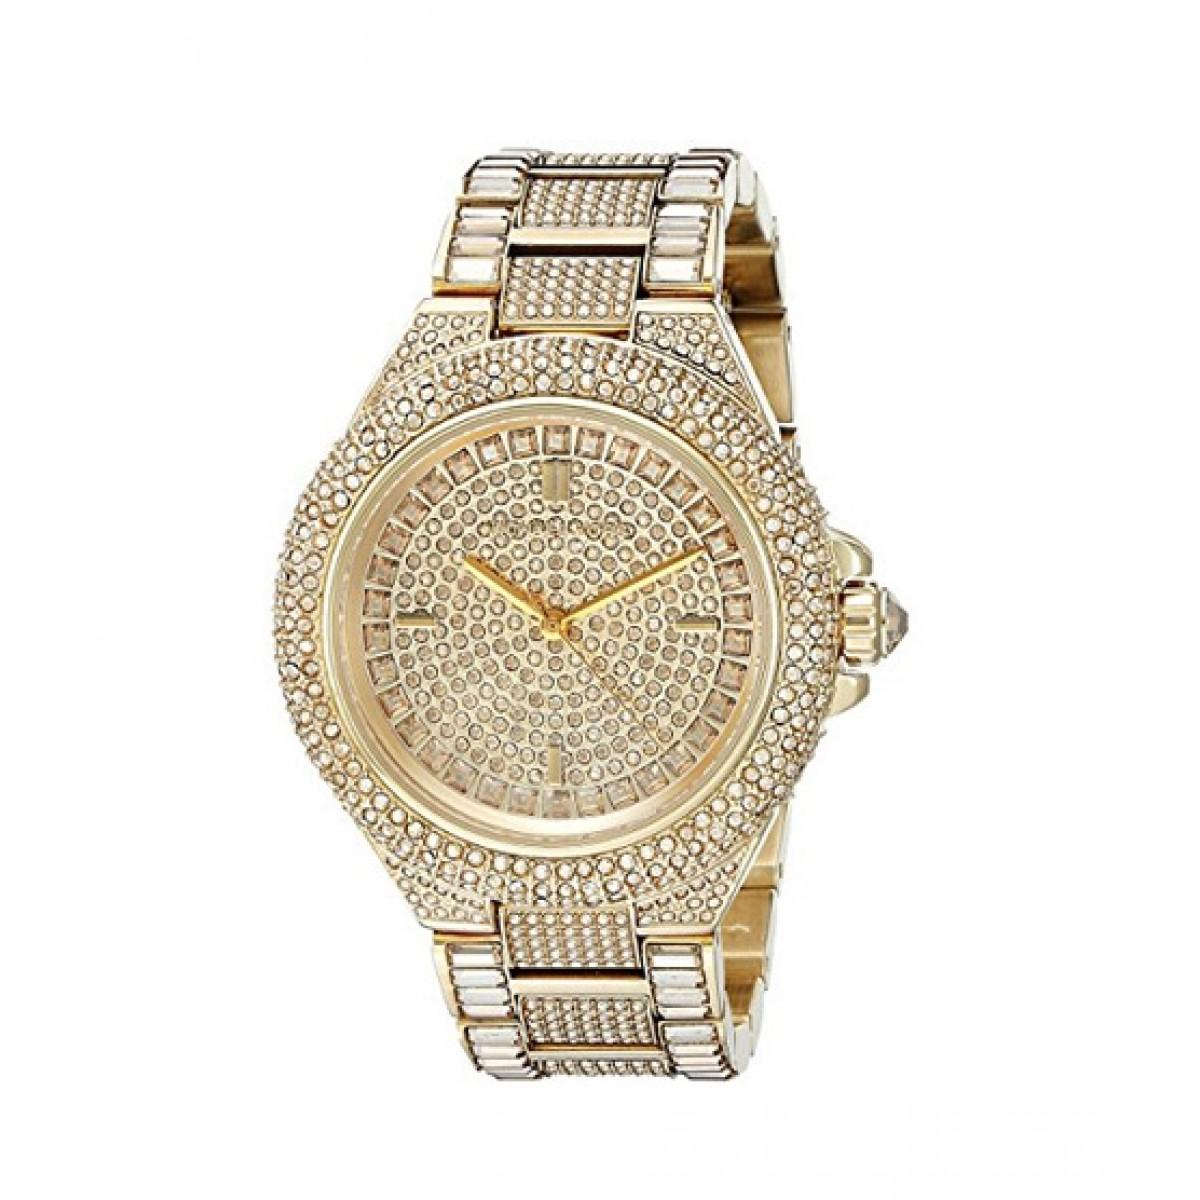 ca6cb6d4a0 Michael Kors Camille Women s Watch Price in Pakistan